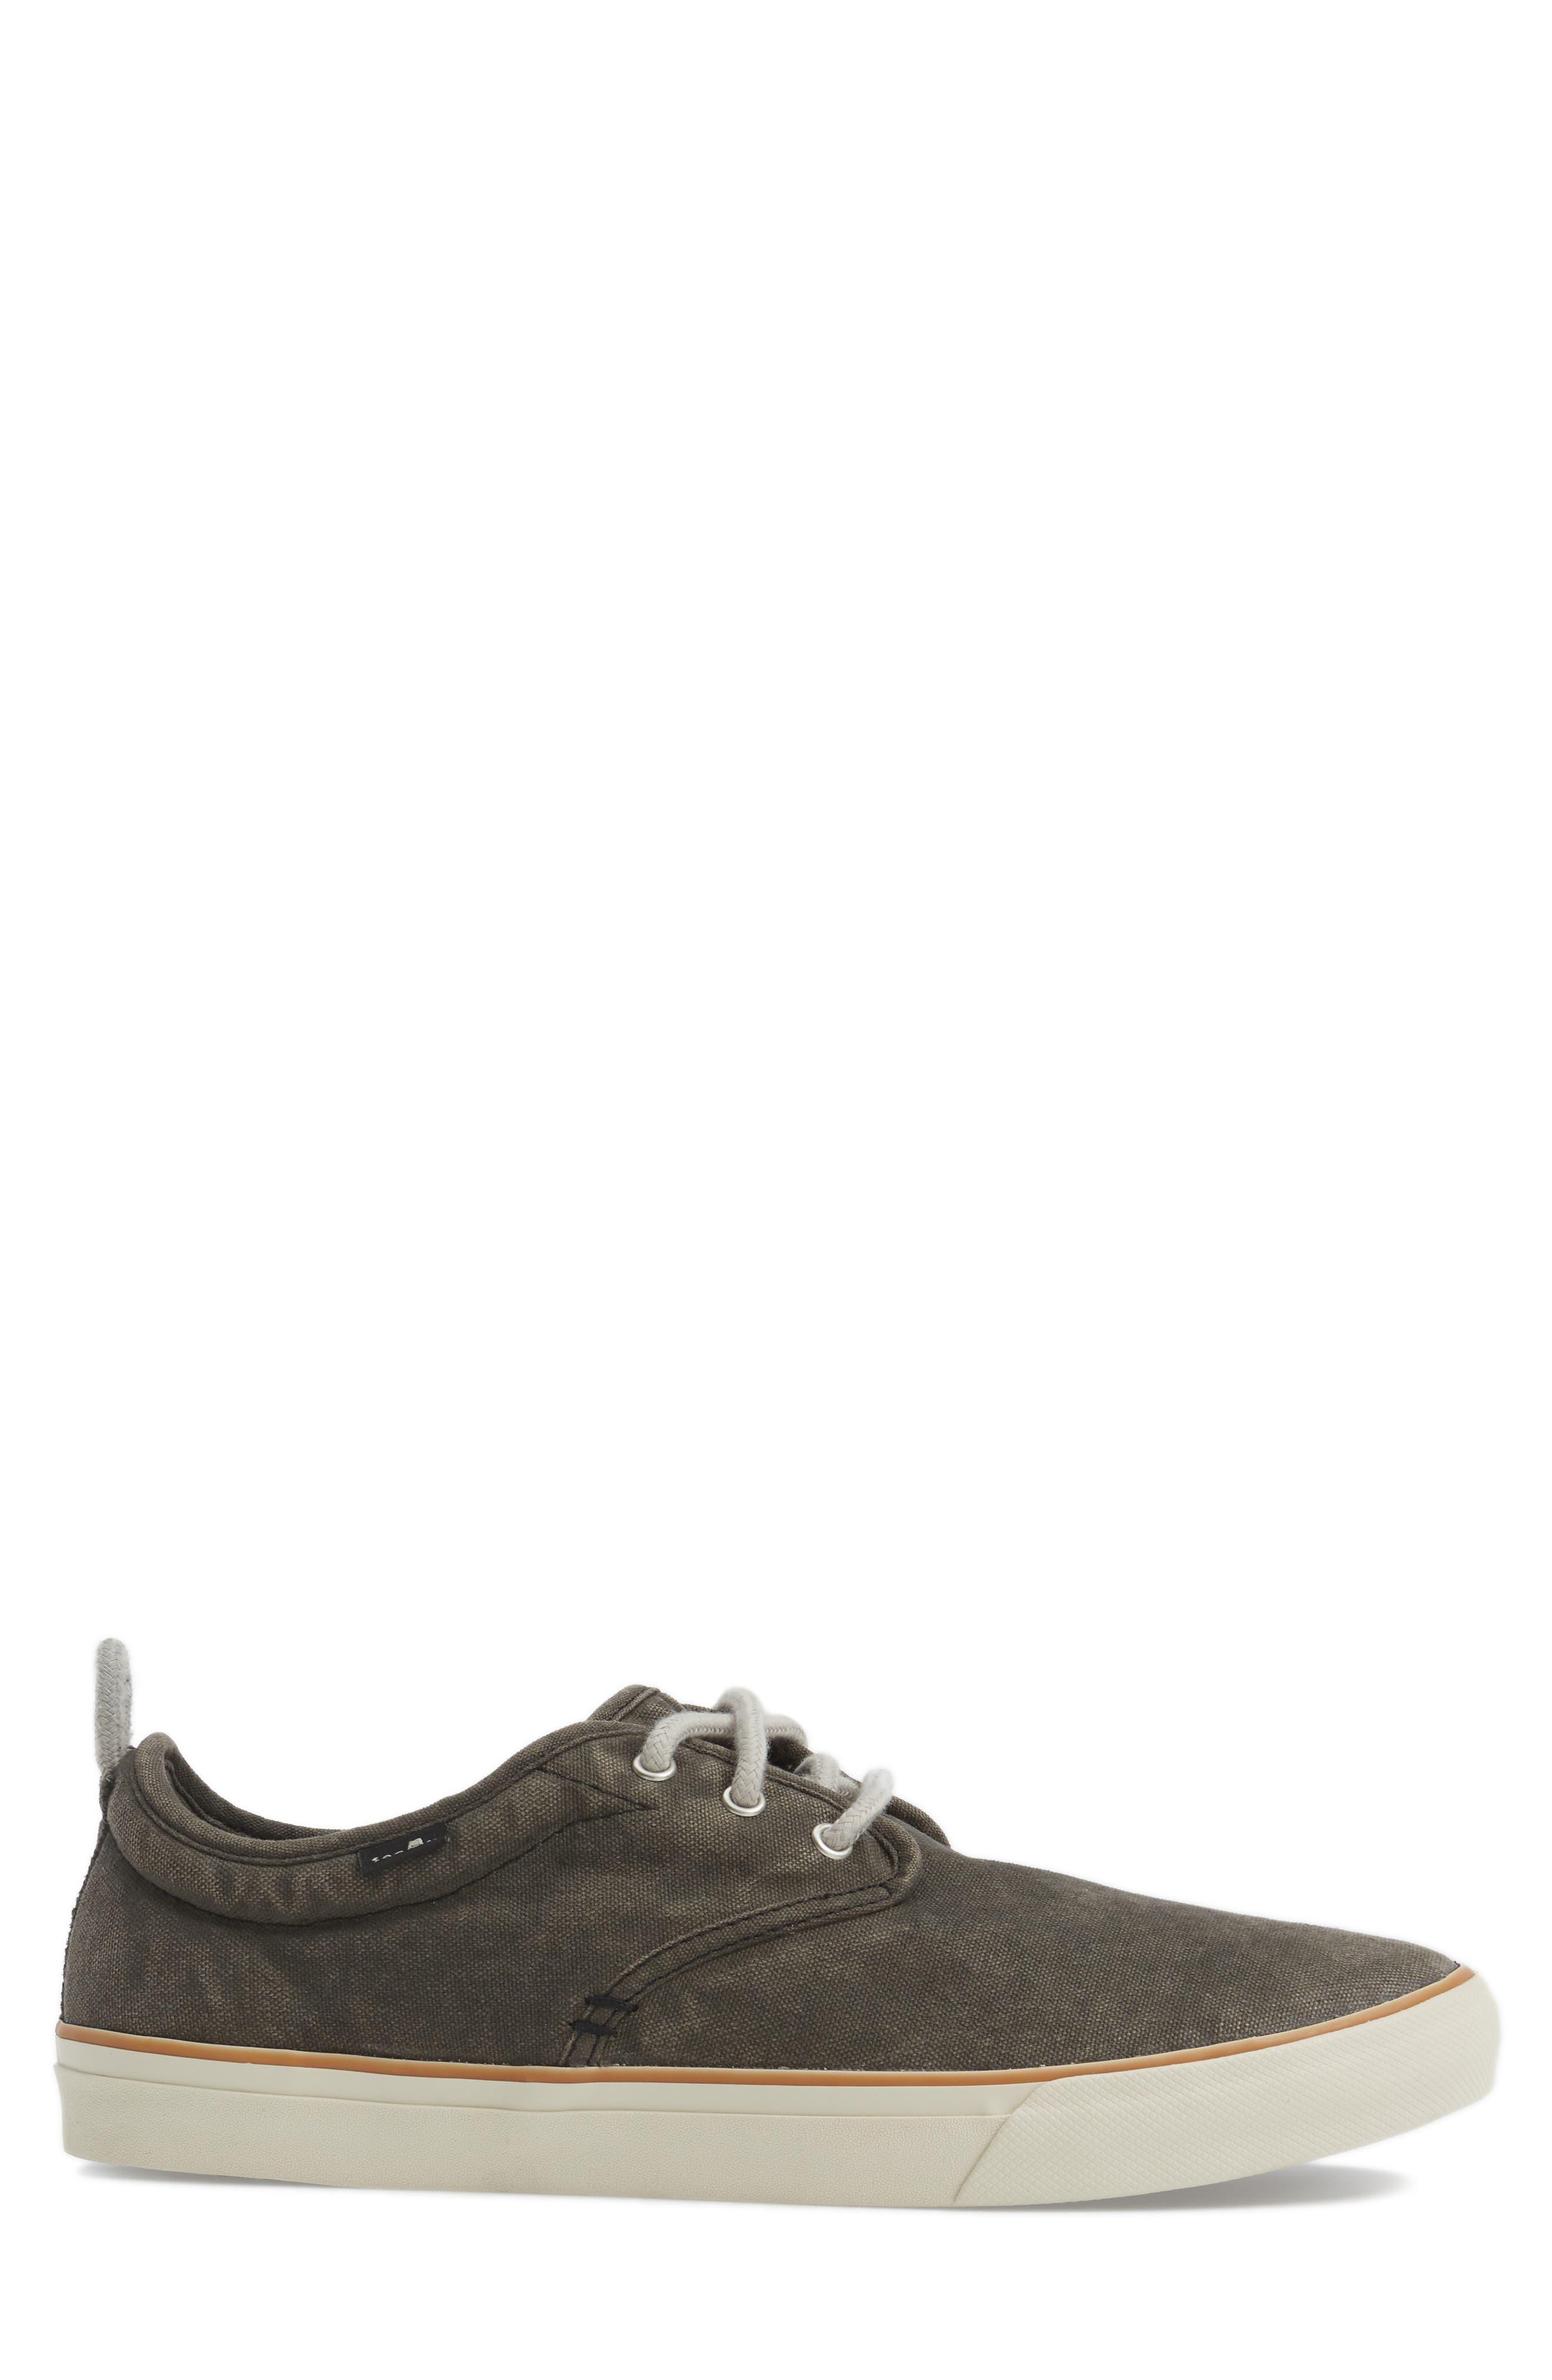 Guide Plus Sneaker,                             Alternate thumbnail 3, color,                             006